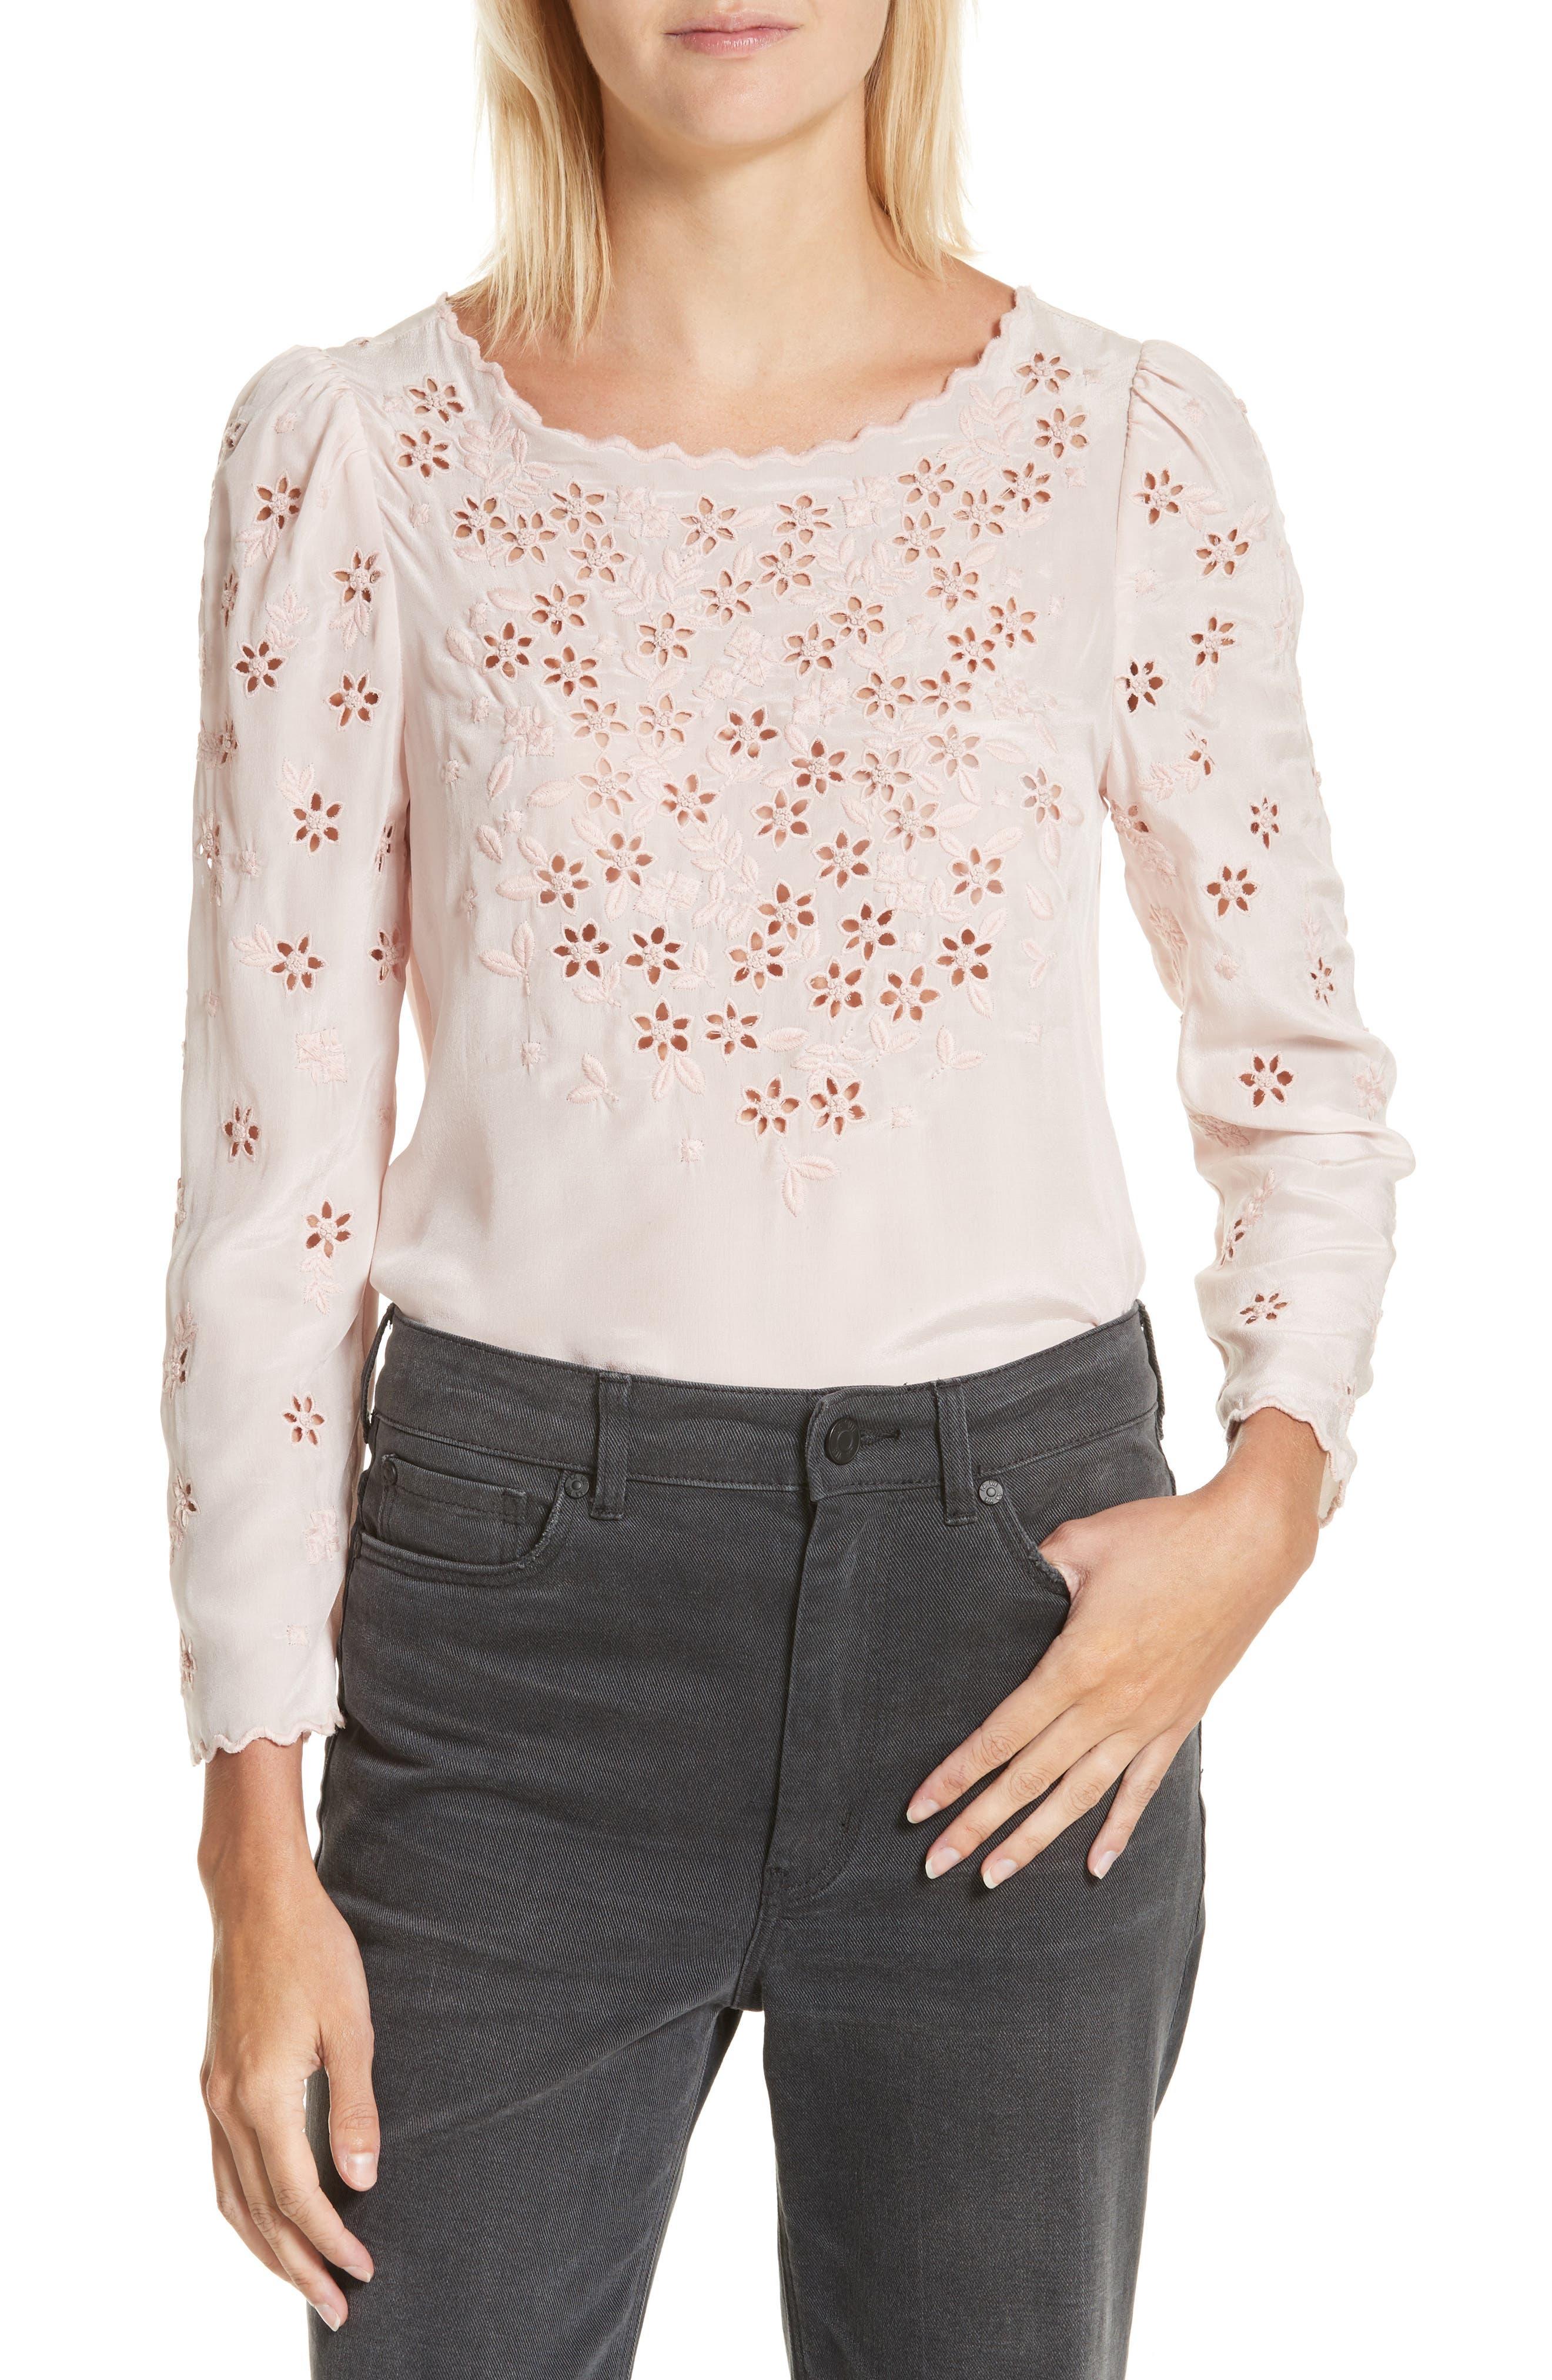 Alternate Image 1 Selected - Rebecca Taylor Miranda Embroidered Silk Top